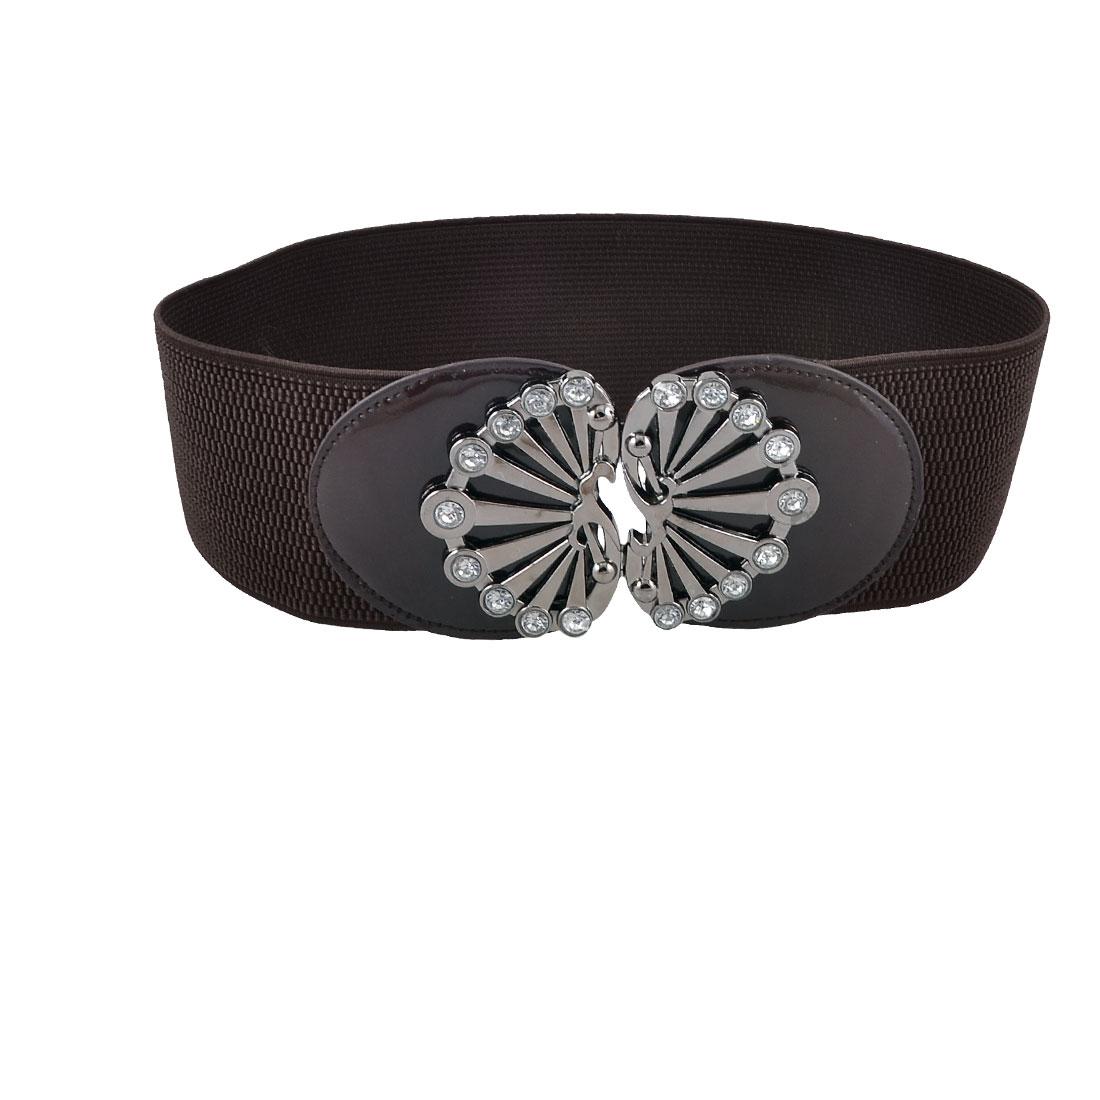 Lady Rhinestones Interlocking Buckle Dark Brown Wide Stretchy Waistband Belt